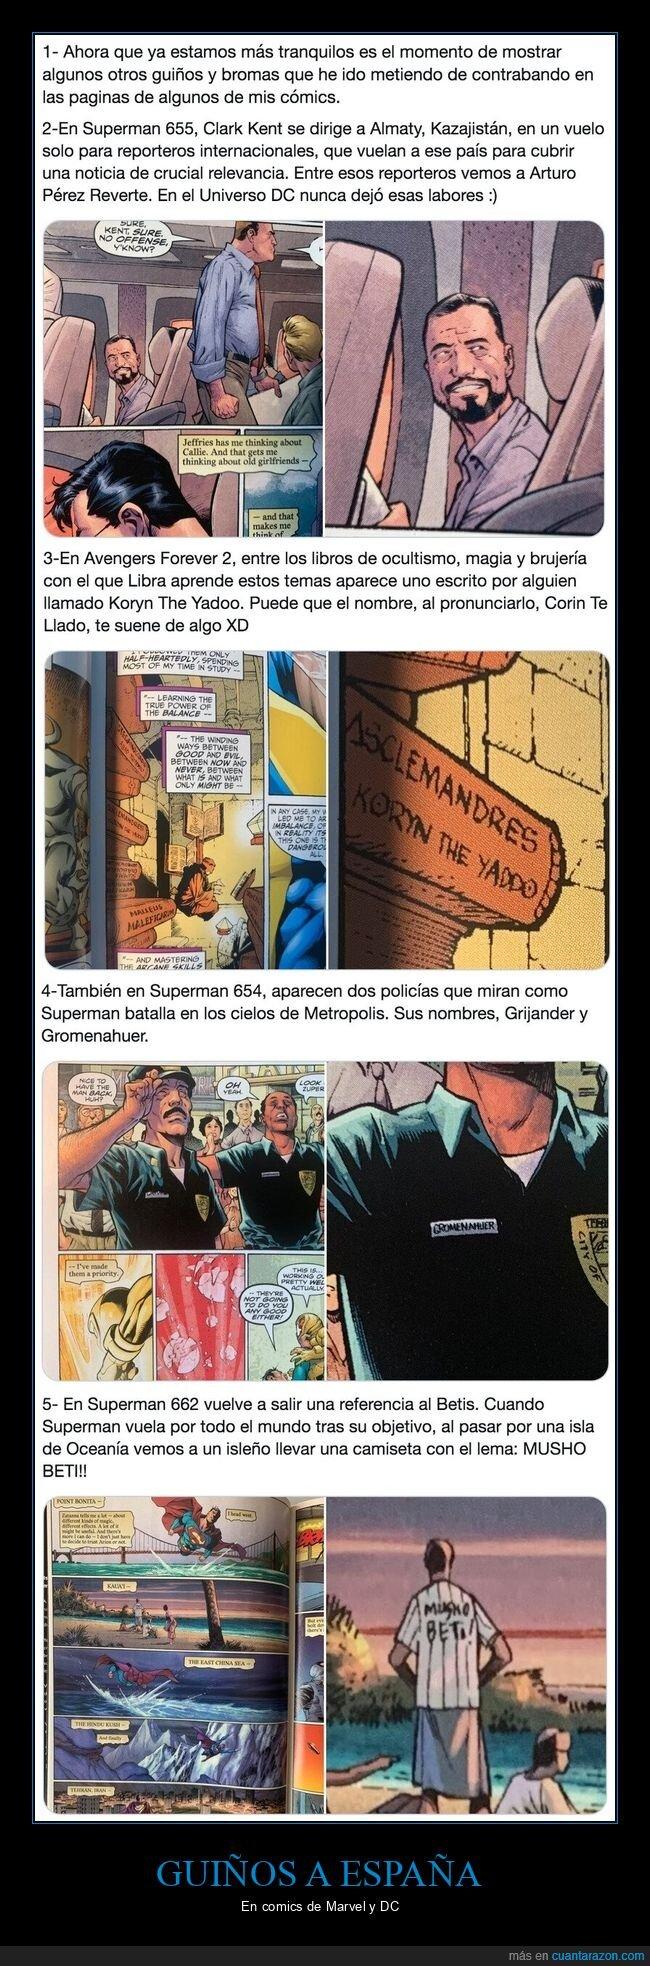 Betis,Chiquito,comics,dc,españa,marvel,Reverte